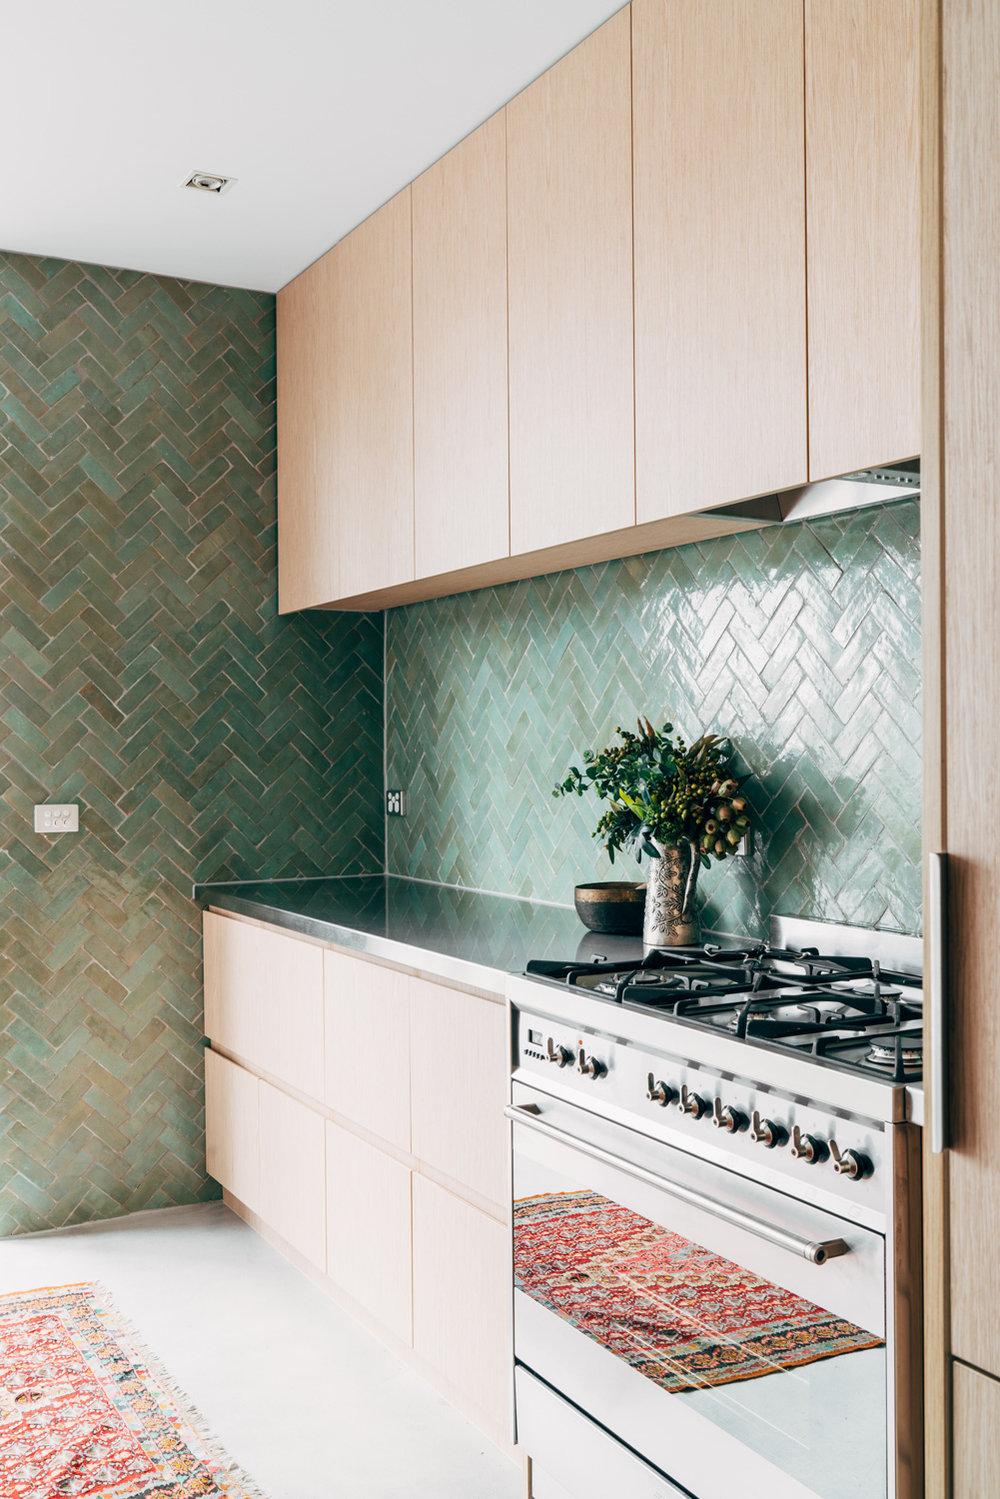 TILES OF EZRA Studio Ezra FL006 Aqua Moroccan Bejmat kitchen splashback .jpg